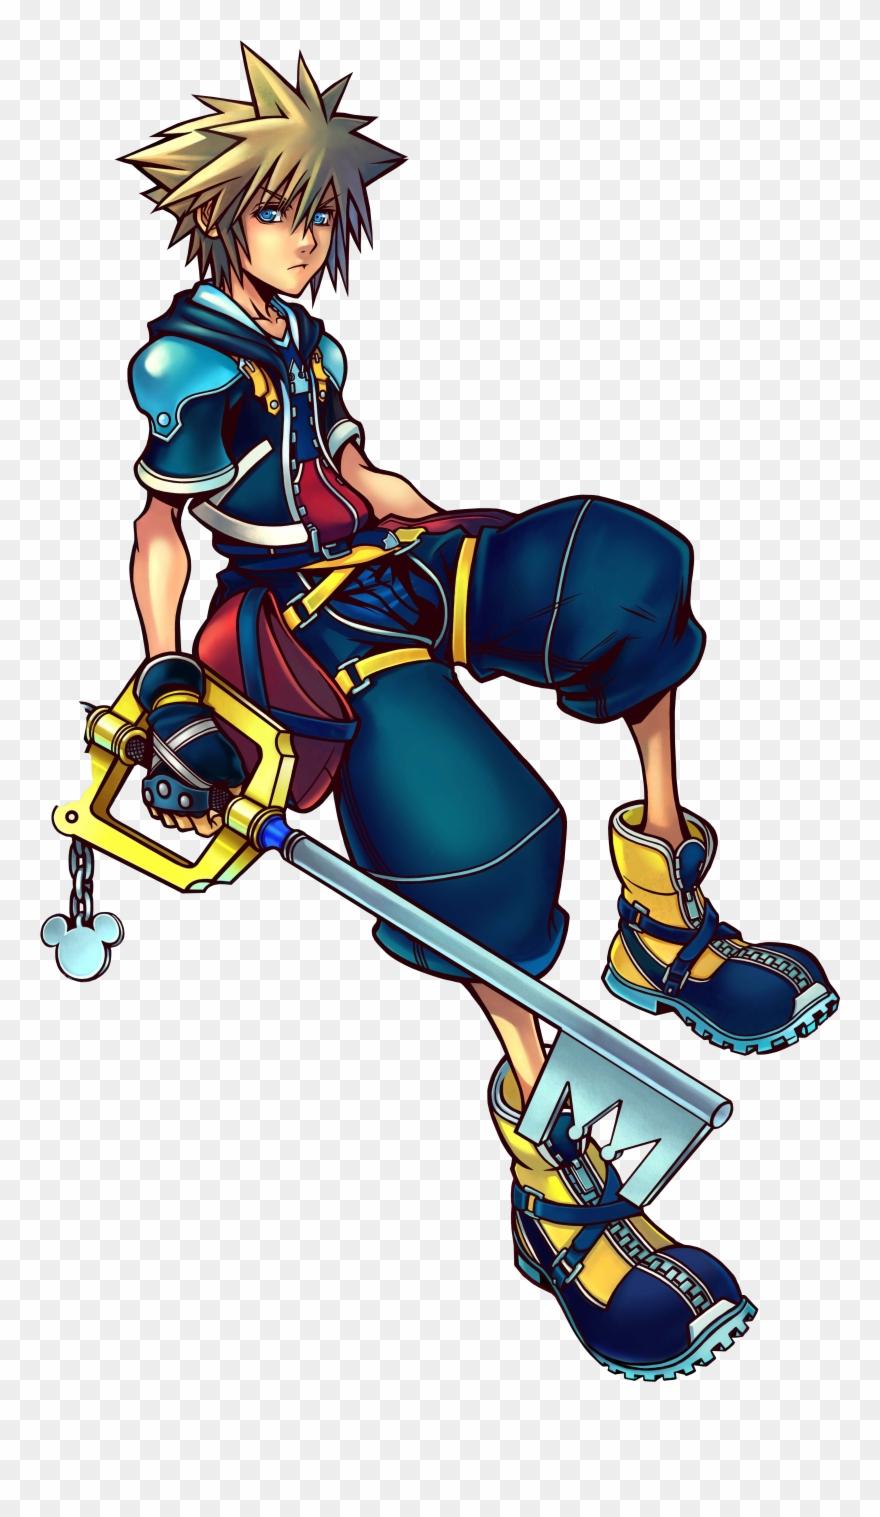 Kingdom hearts sora clipart jpg freeuse download Kingdom Hearts Crown Clipart - Kingdom Hearts Sora Art - Png ... jpg freeuse download